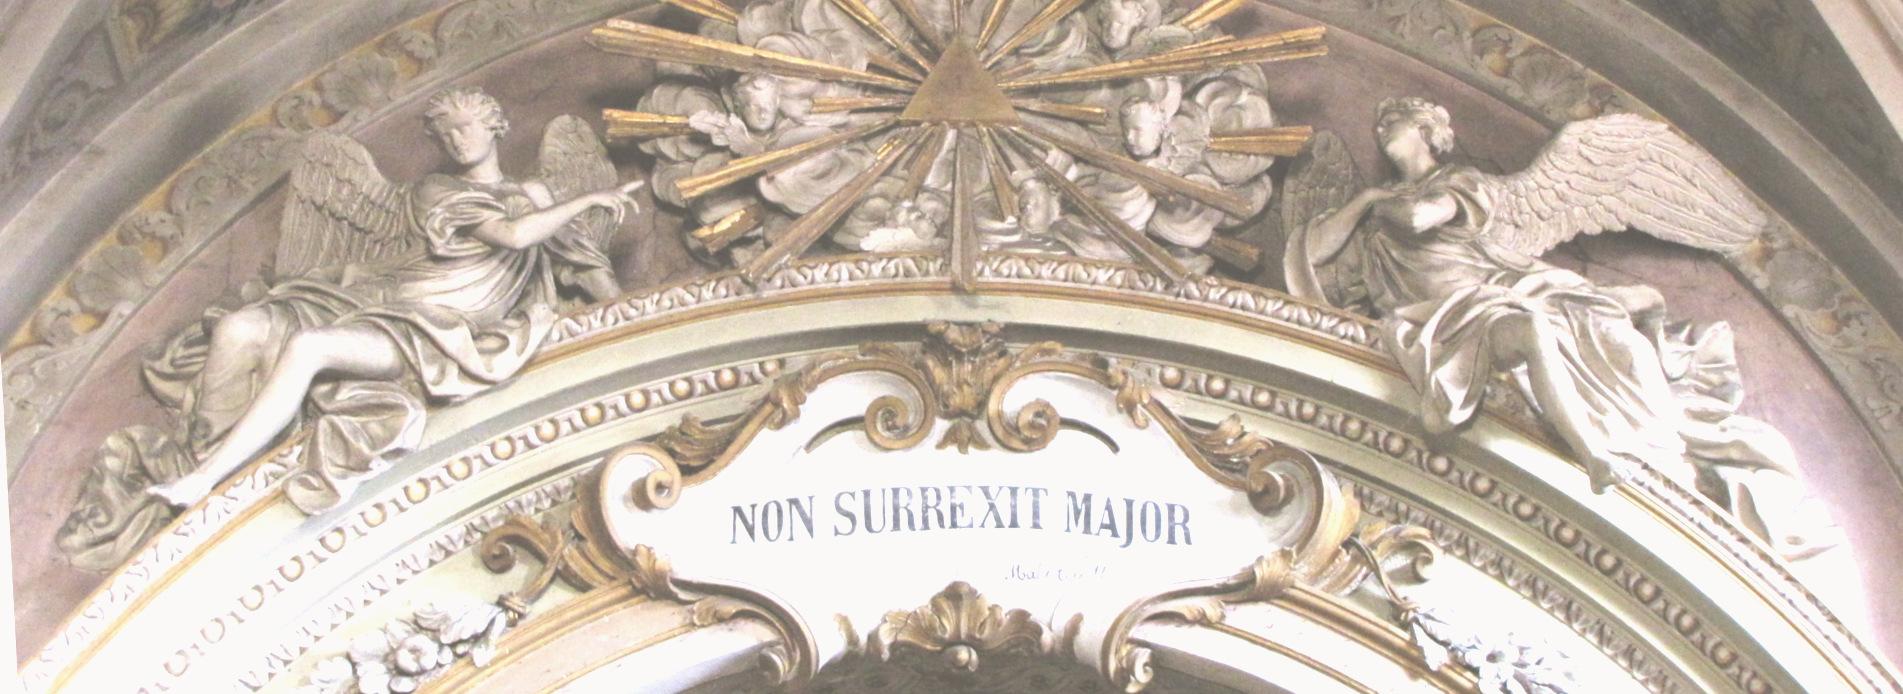 San Giovanni Battista